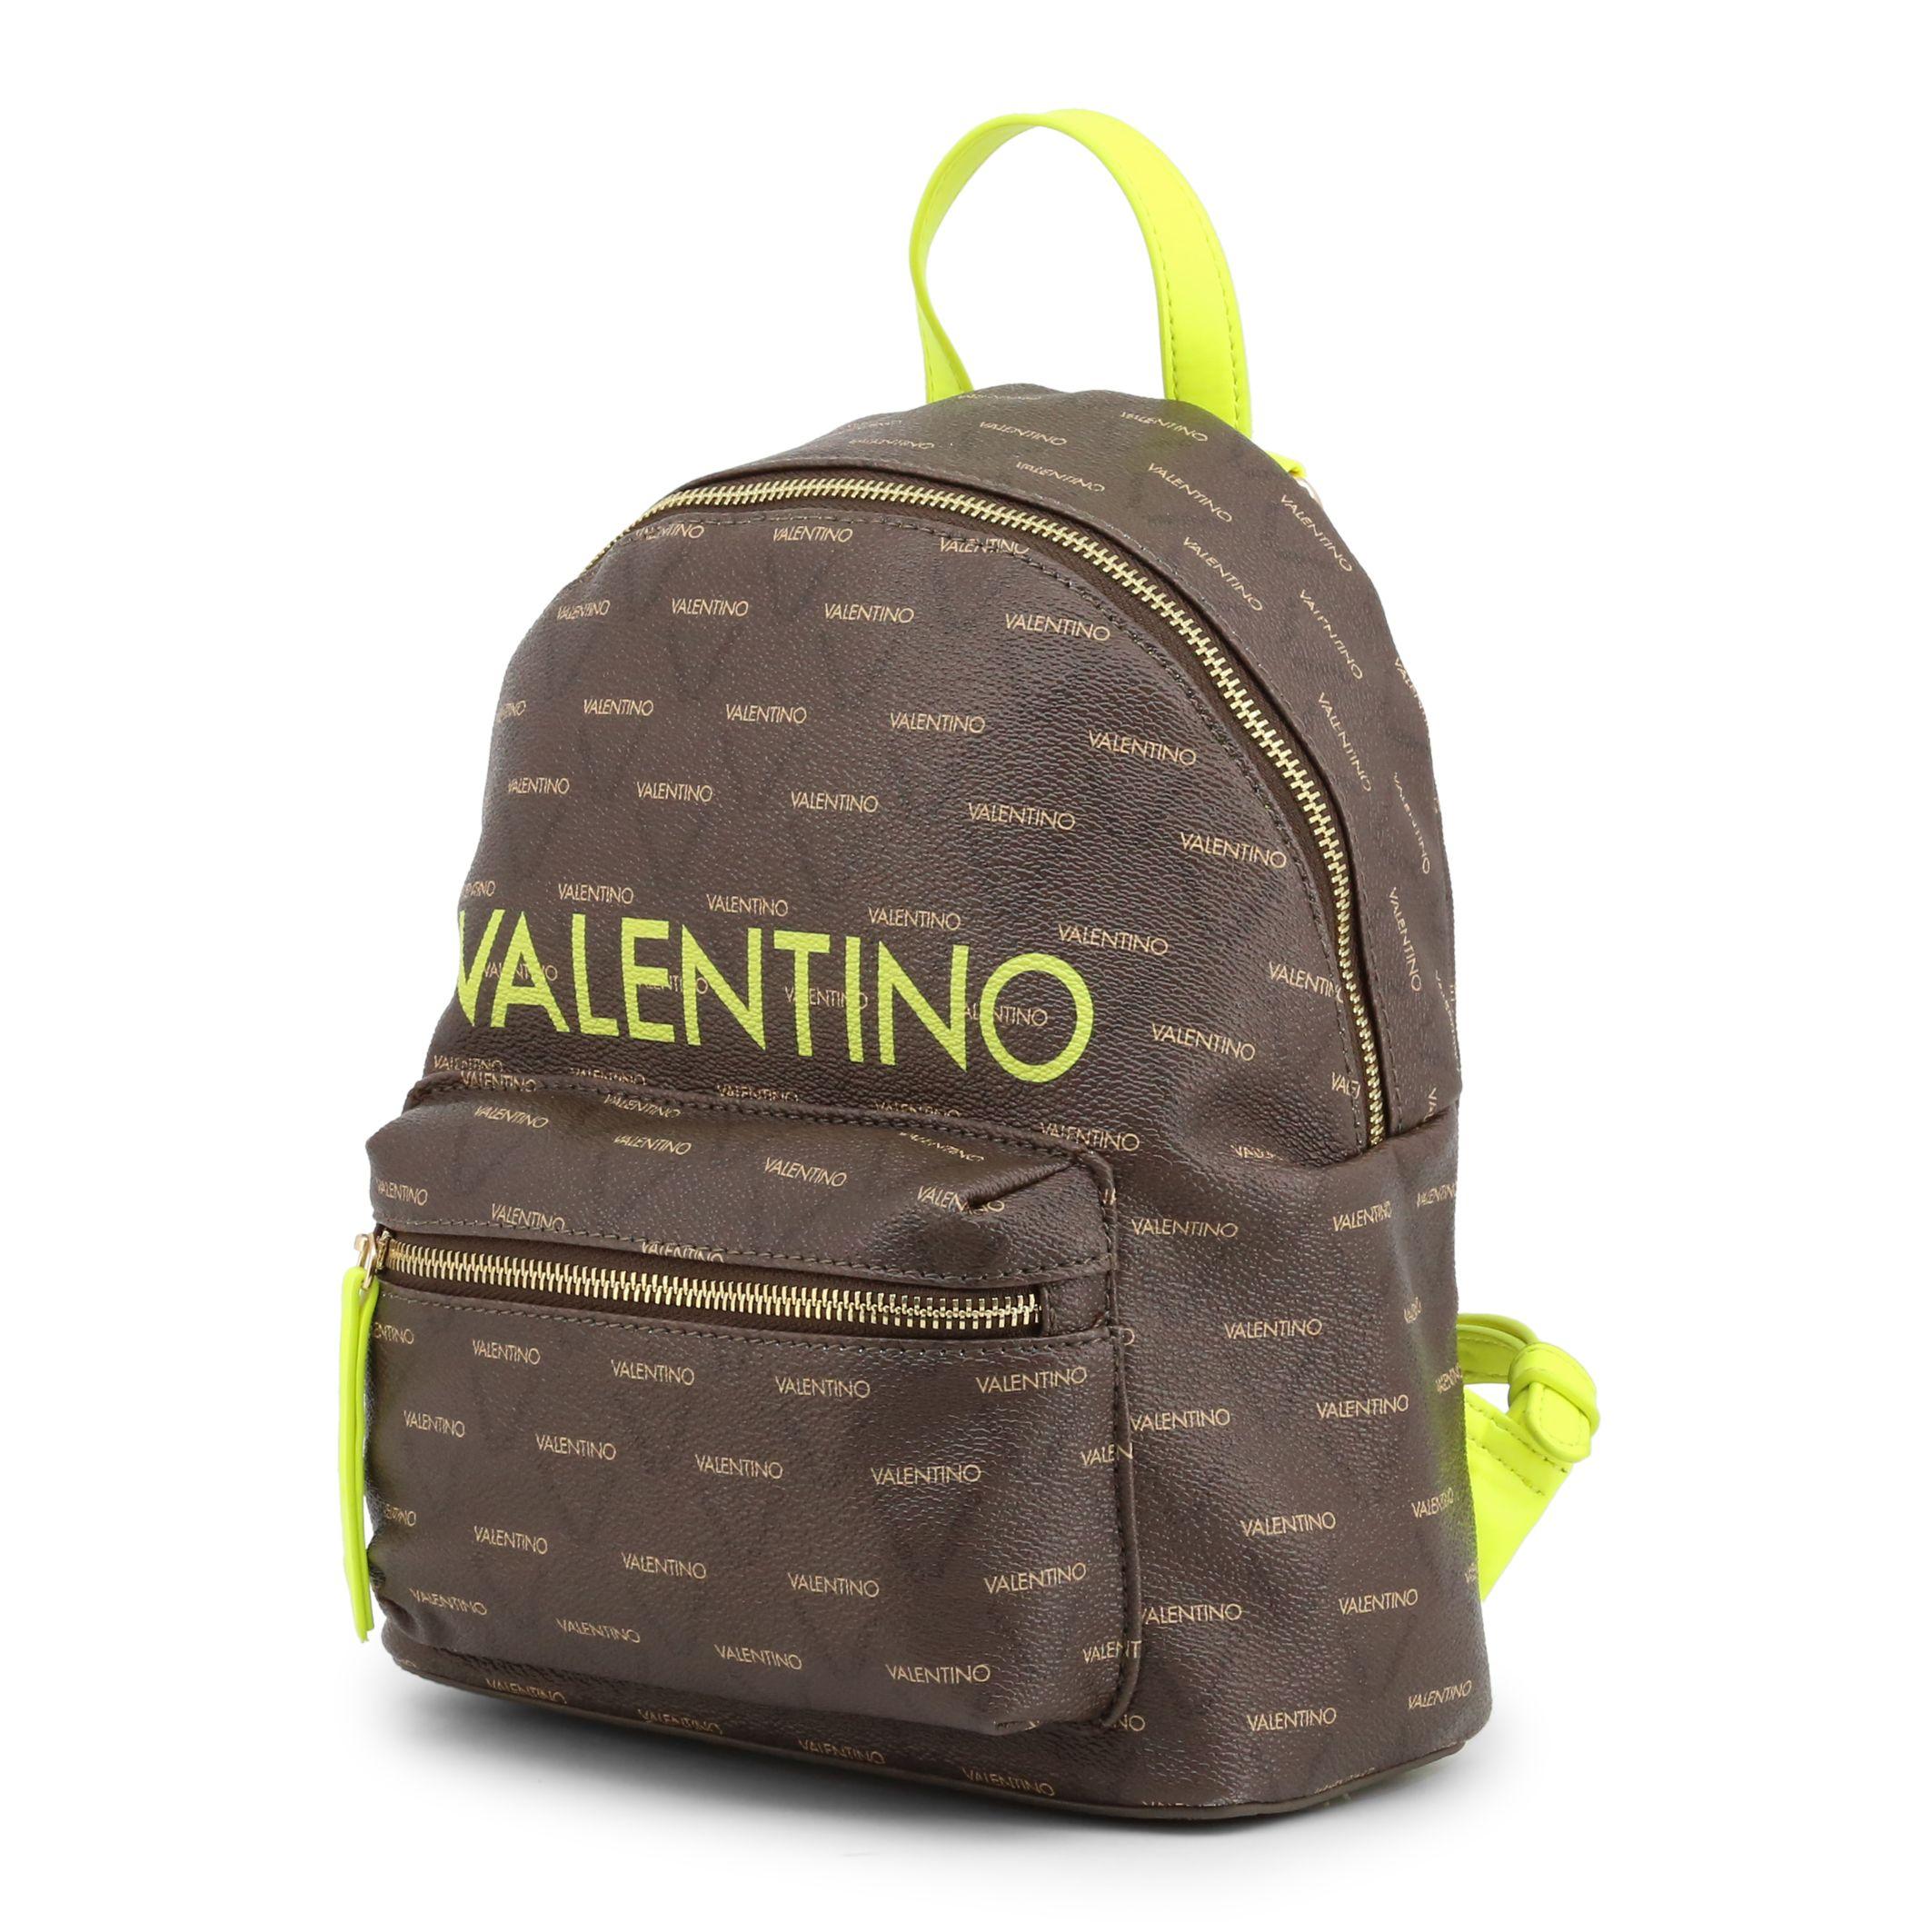 Valentino by Mario Valentino – LIUTOFLUO-VBS46810